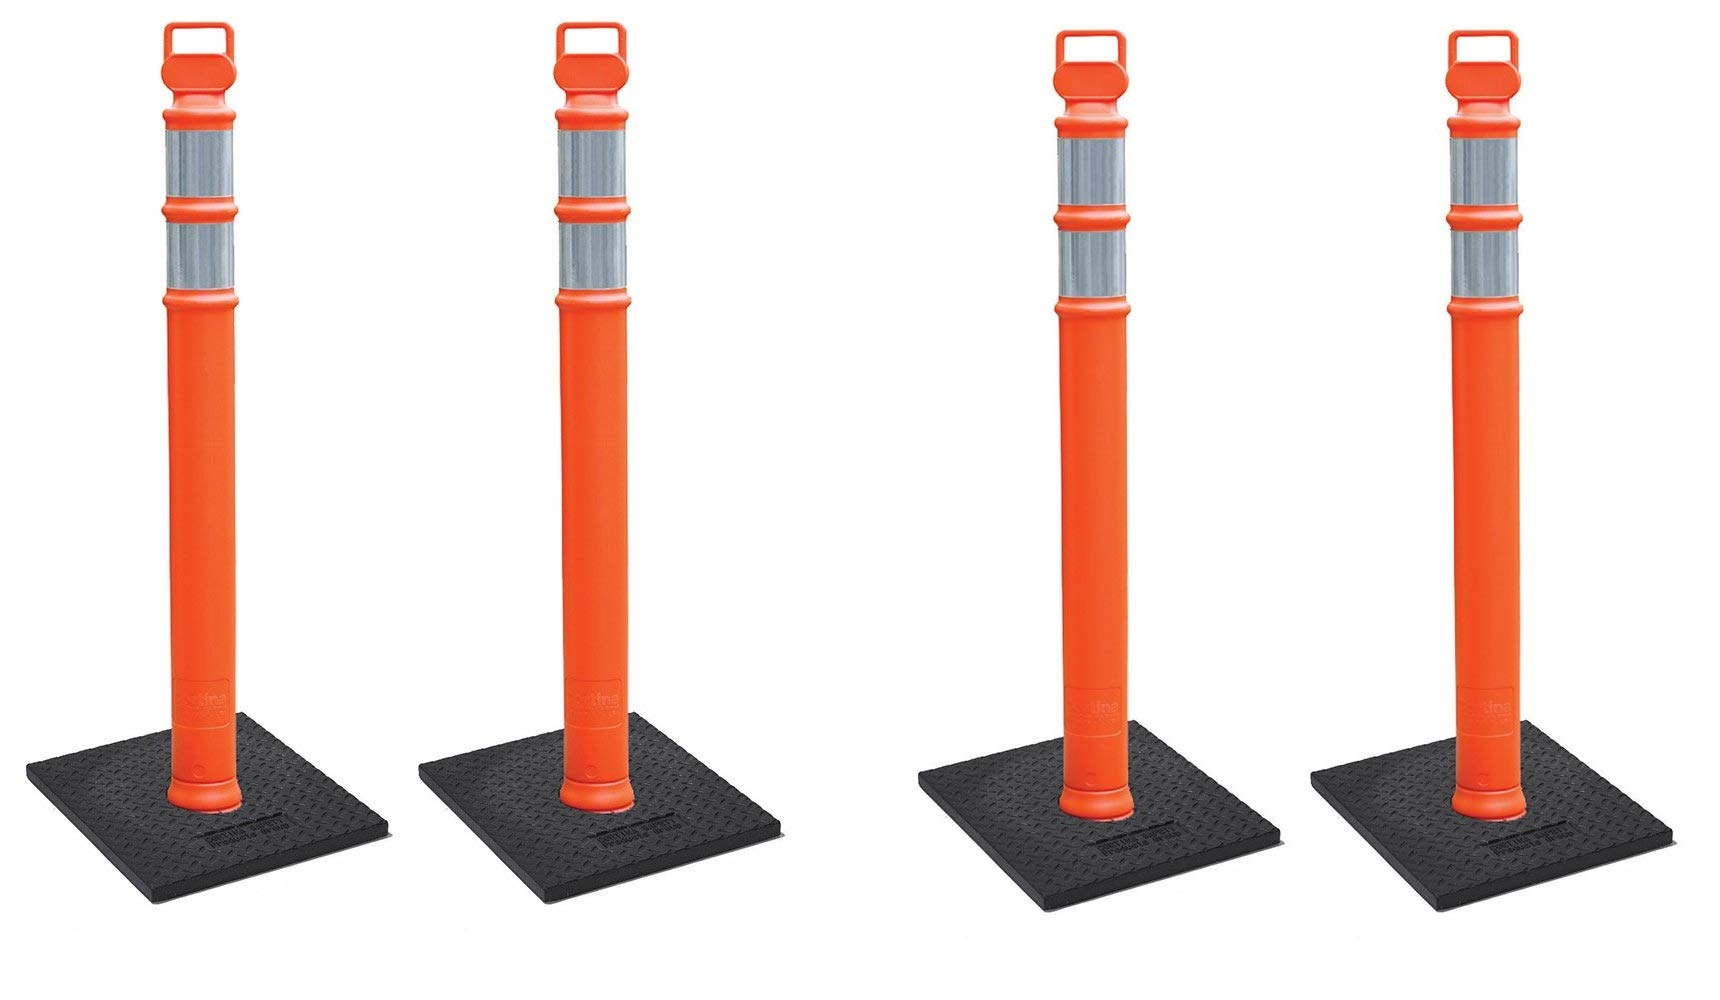 Cortina EZ Grab Delineator 45'' Post, 3'' Hip Collars with 10 lb Base, 03-747RBC-2, Orange (2 X Pack of 2)